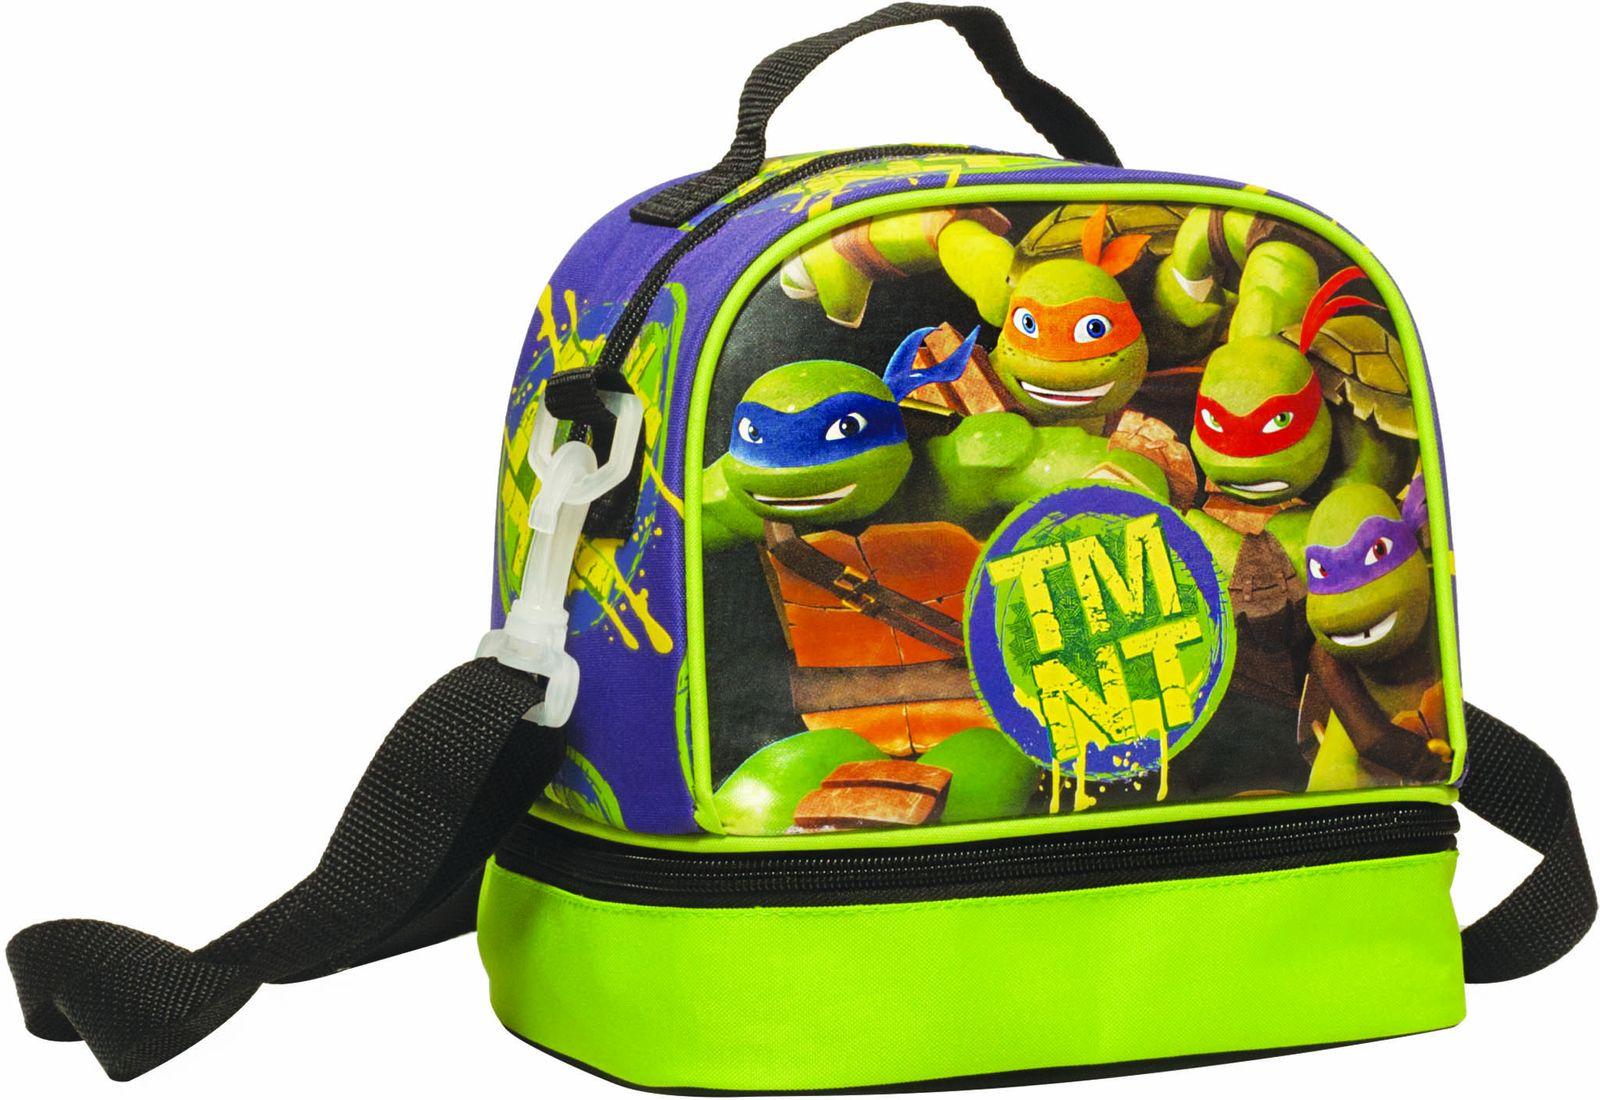 1bb97a697c7 Τσάντα δημοτικού · Τσαντάκι Φαγητού Οβαλ Ninja Good Guys Gim 334-09220